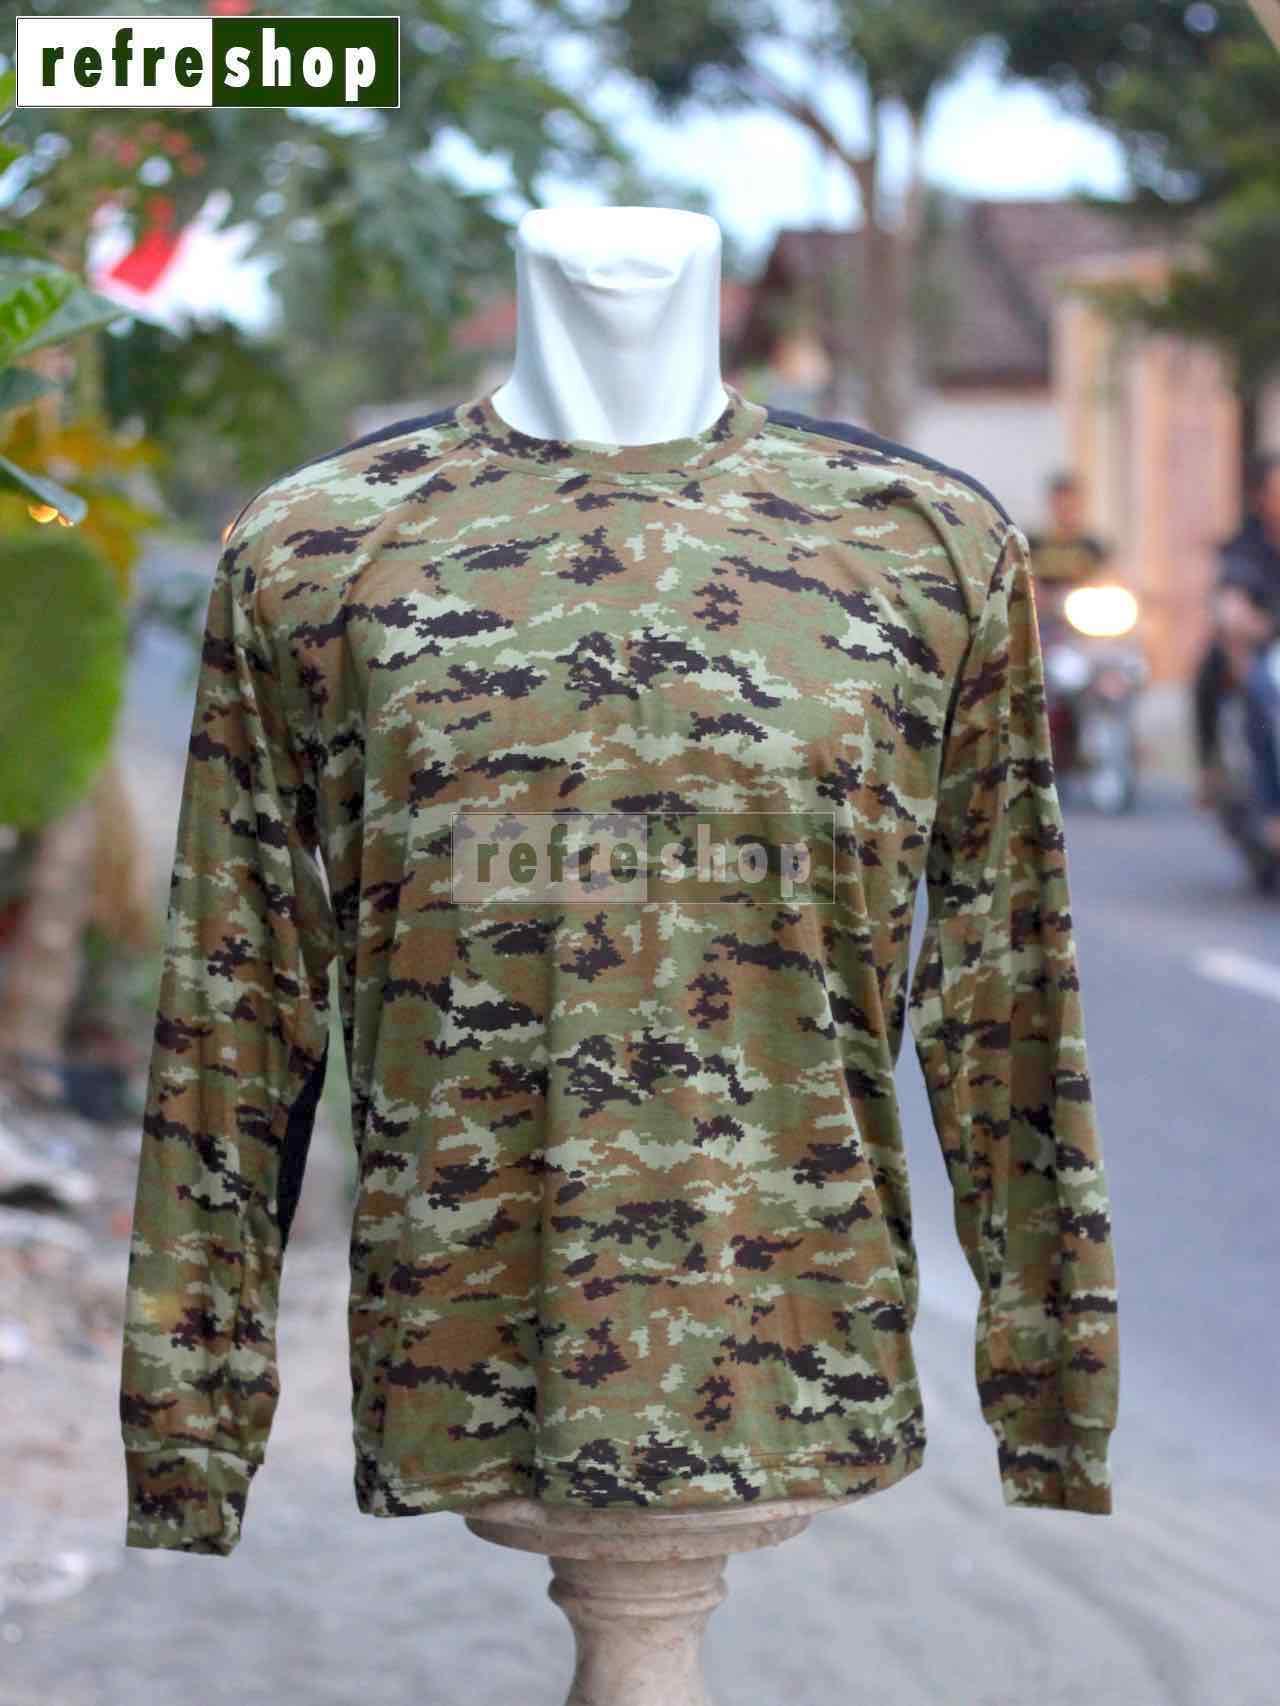 Kaos TNI Militer Army KLHM1 Tentara KopassusIDR35000. Rp 42.500